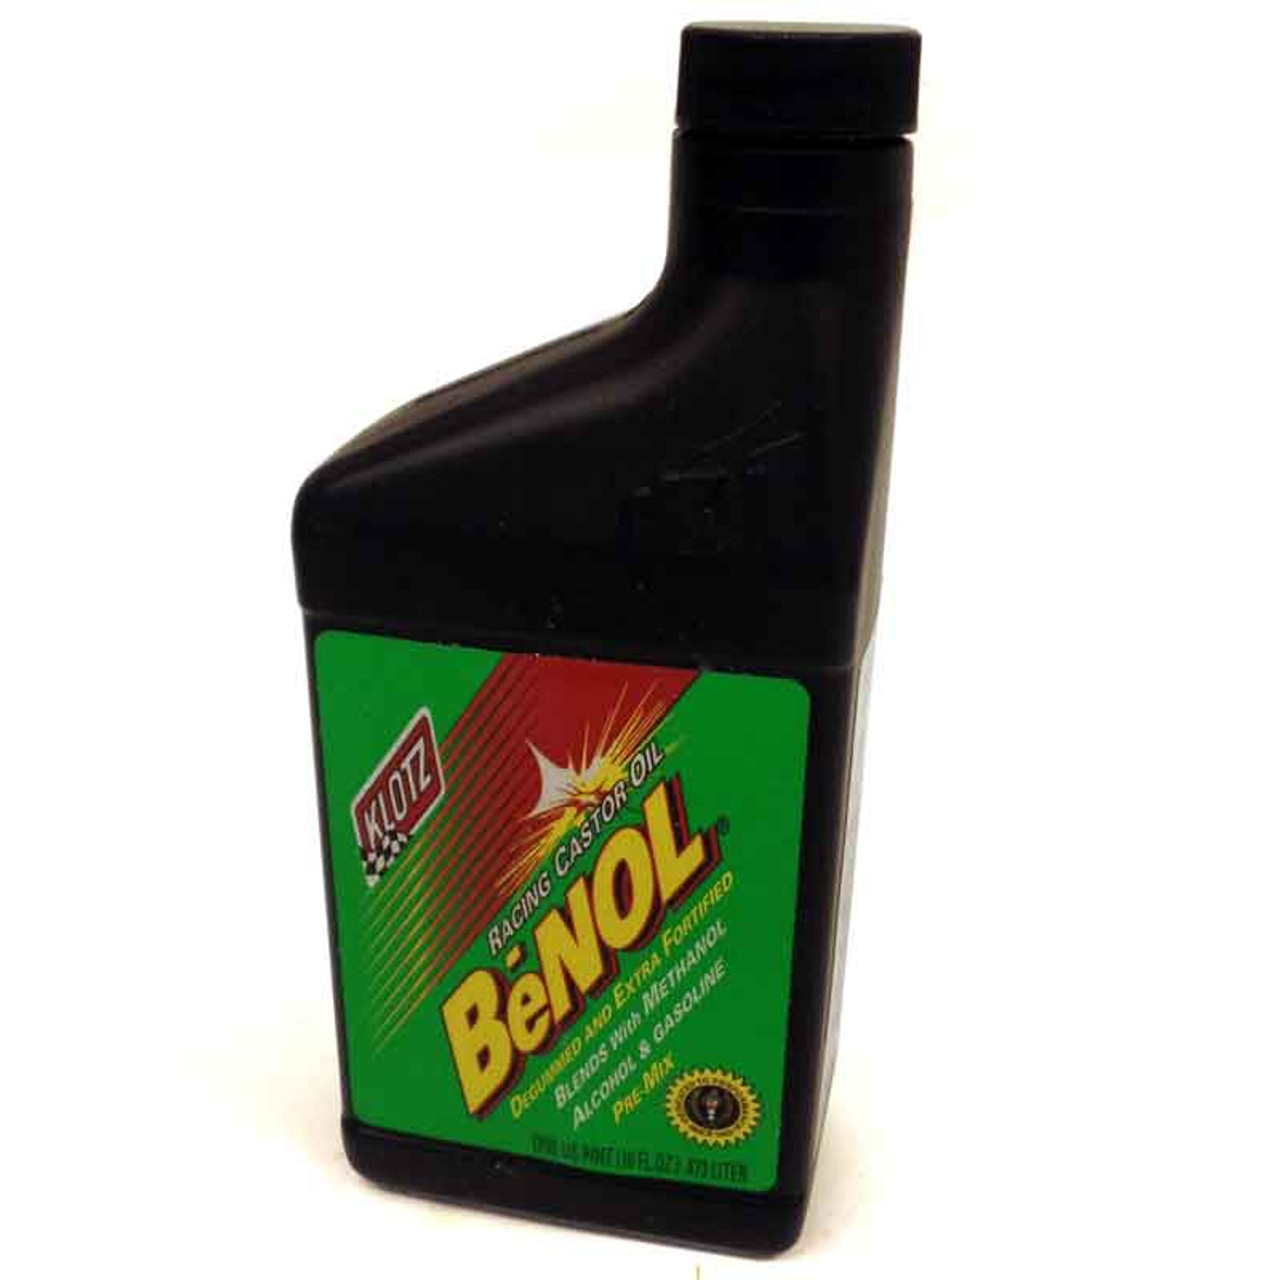 Klotz BeNOL Racing Castor - 1 Pint